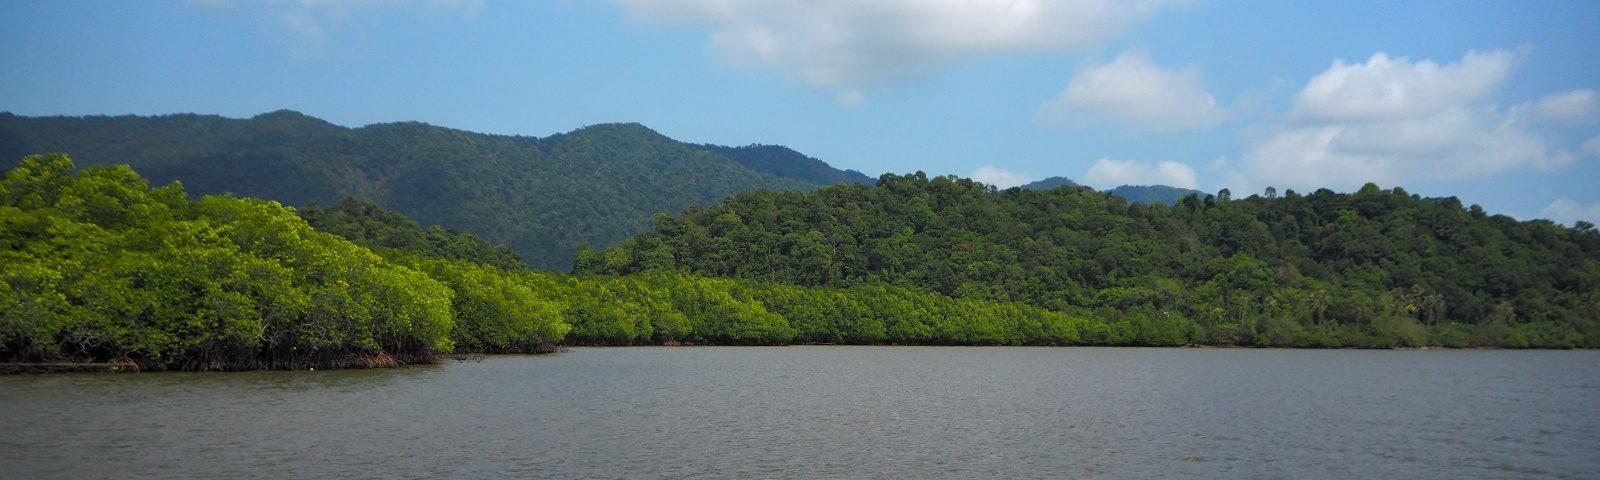 Thailand Koh Chang Salak Phet Mangroven Wald walk way